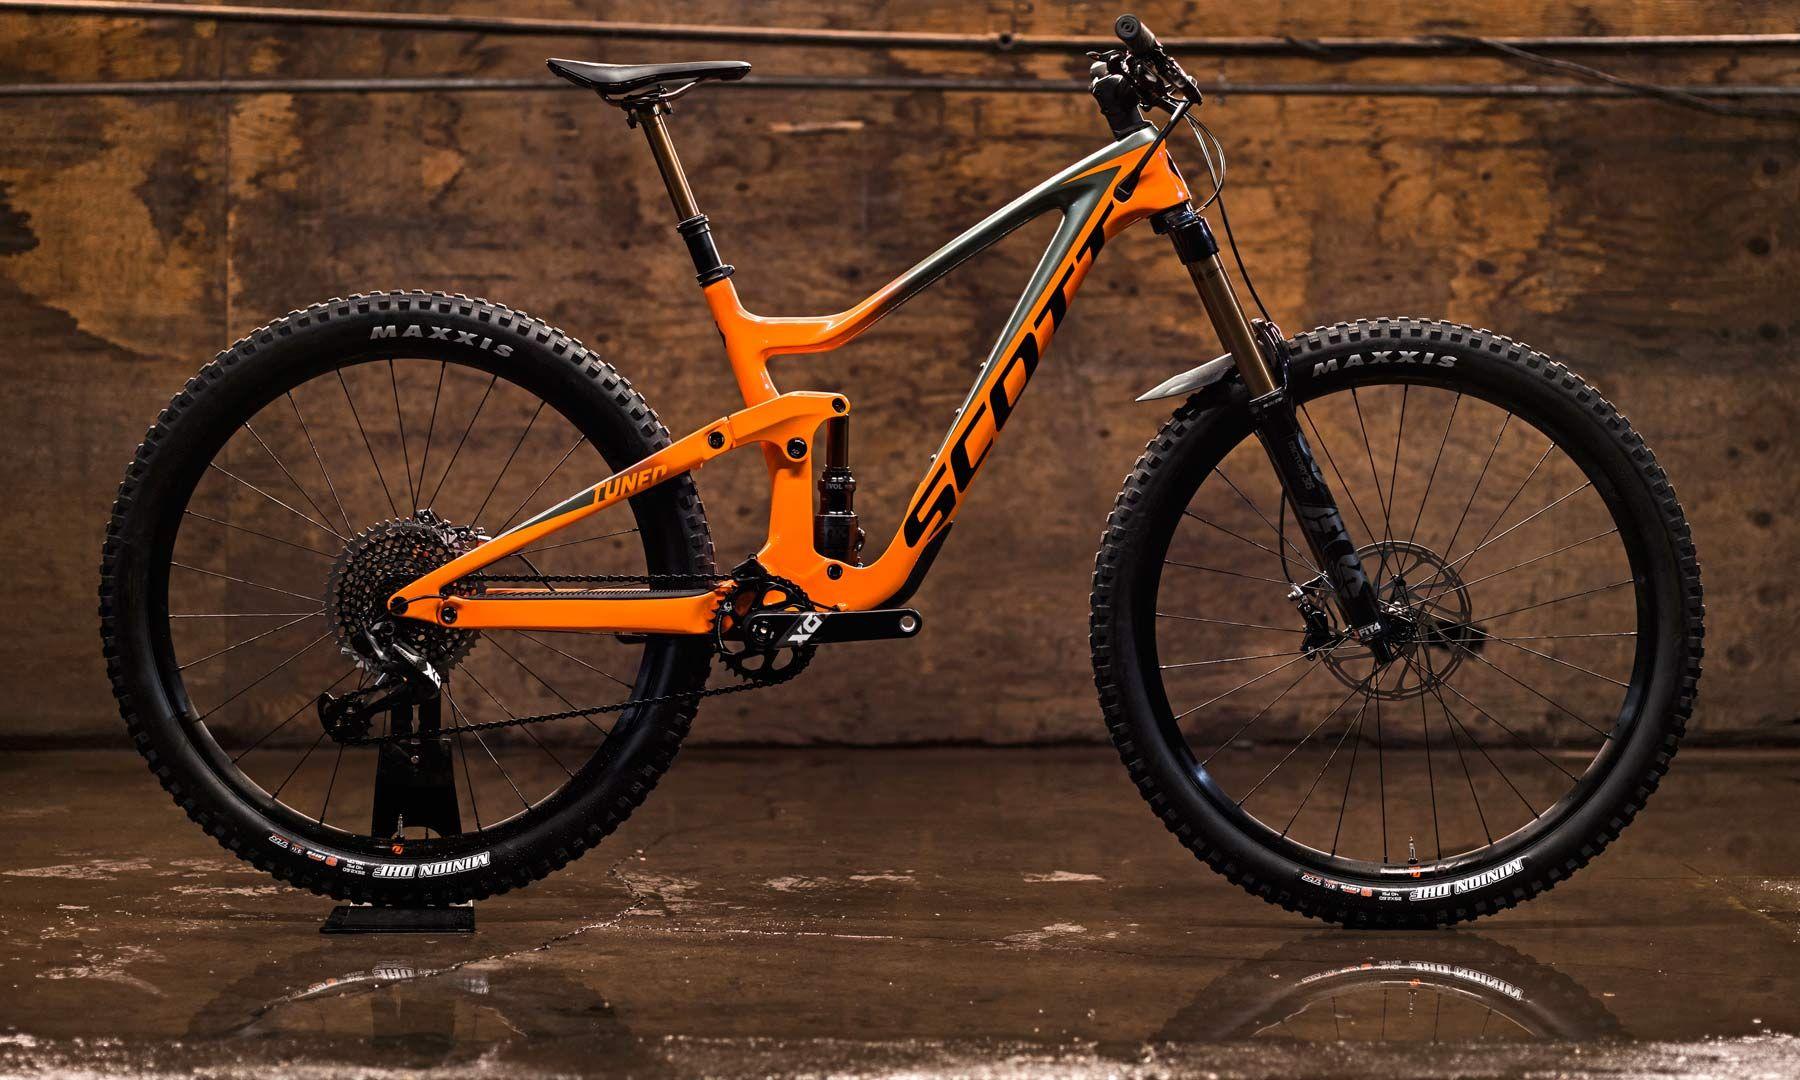 2019 Scott Ransom Complete Enduro Bike Build Options Pricing